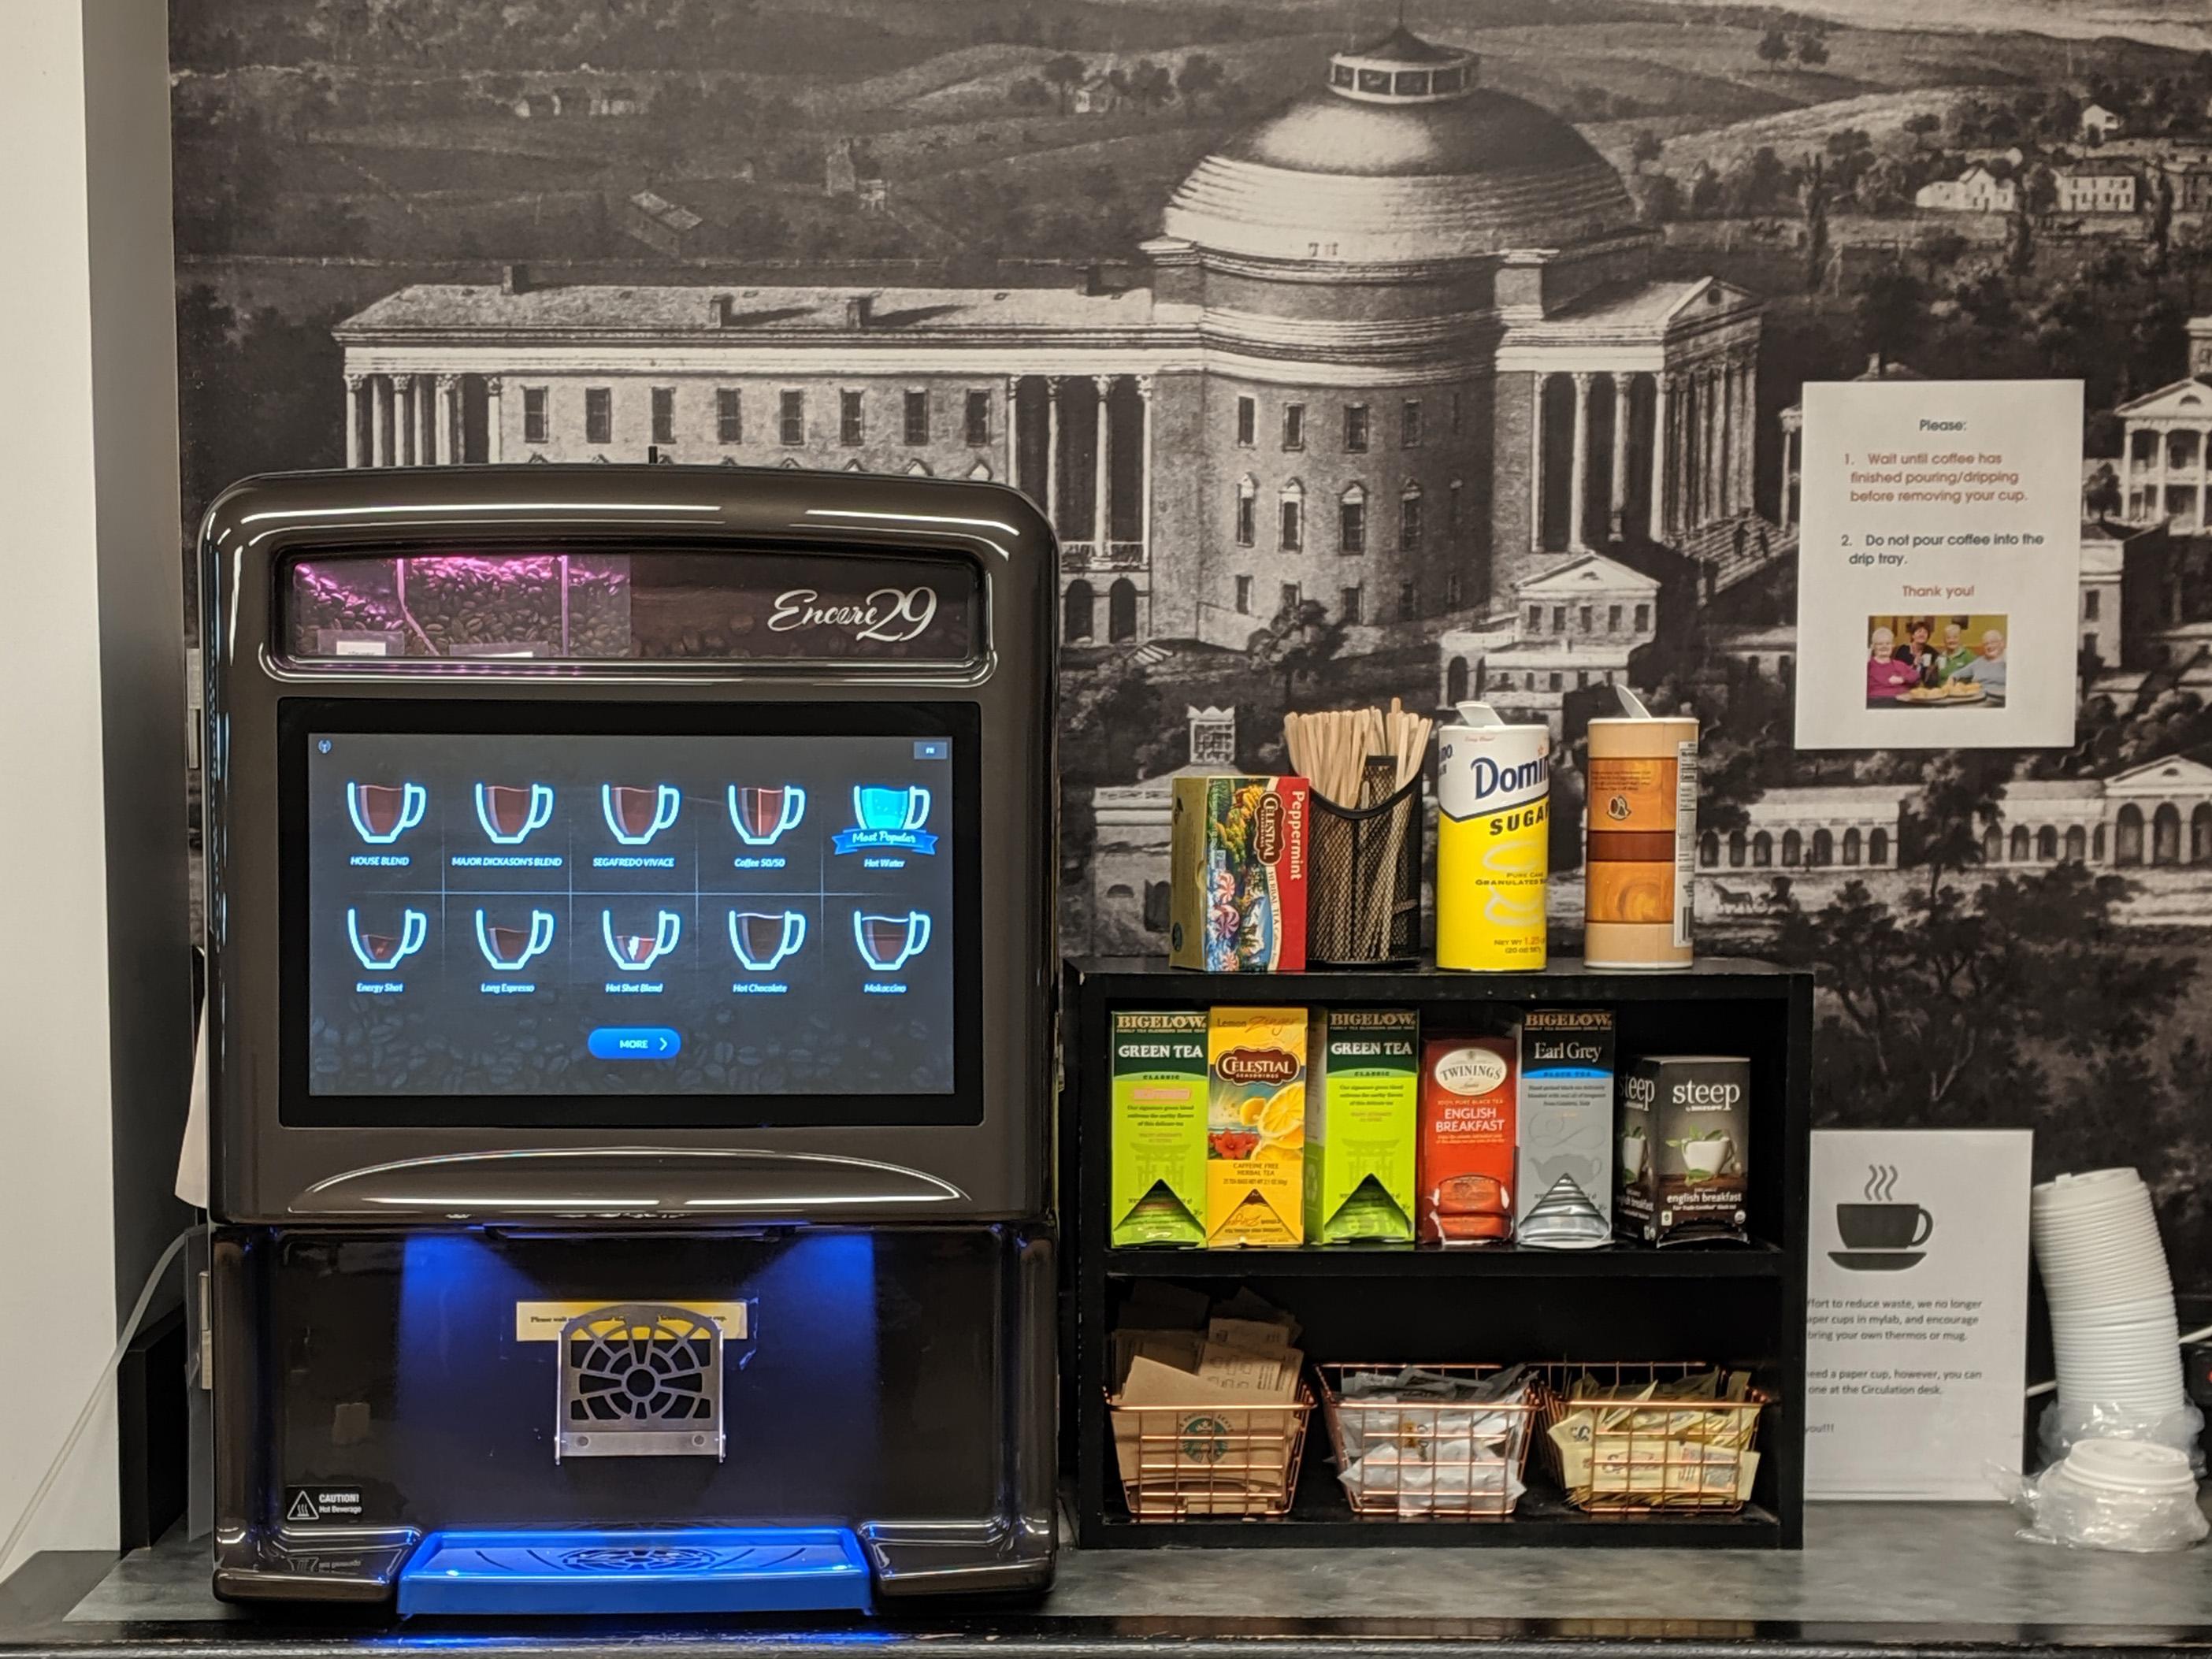 Coffee machine and tea options